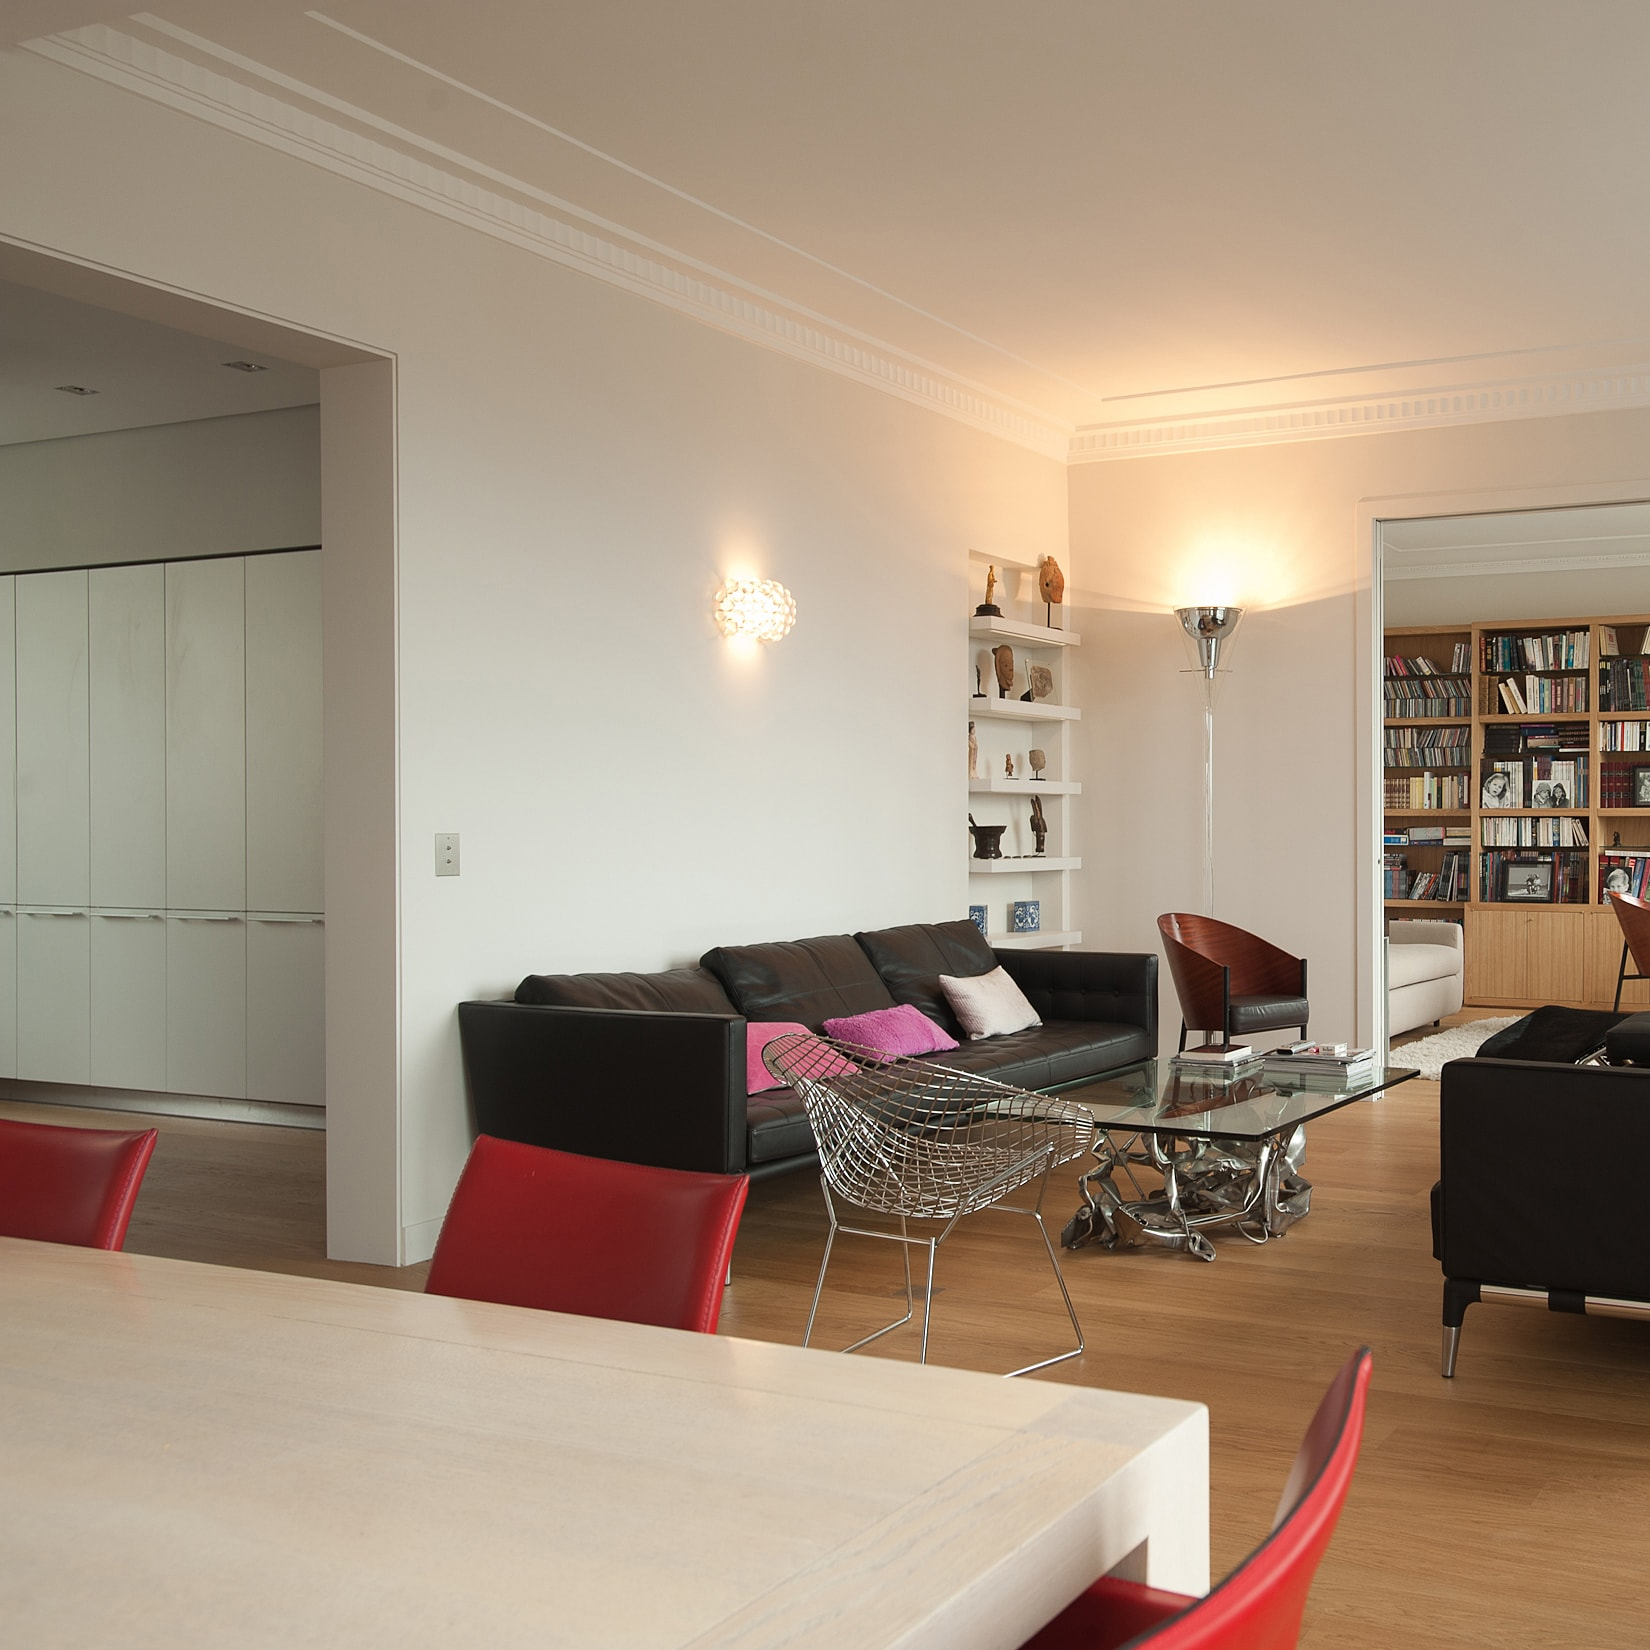 4 mois de travaux i feld architecture. Black Bedroom Furniture Sets. Home Design Ideas